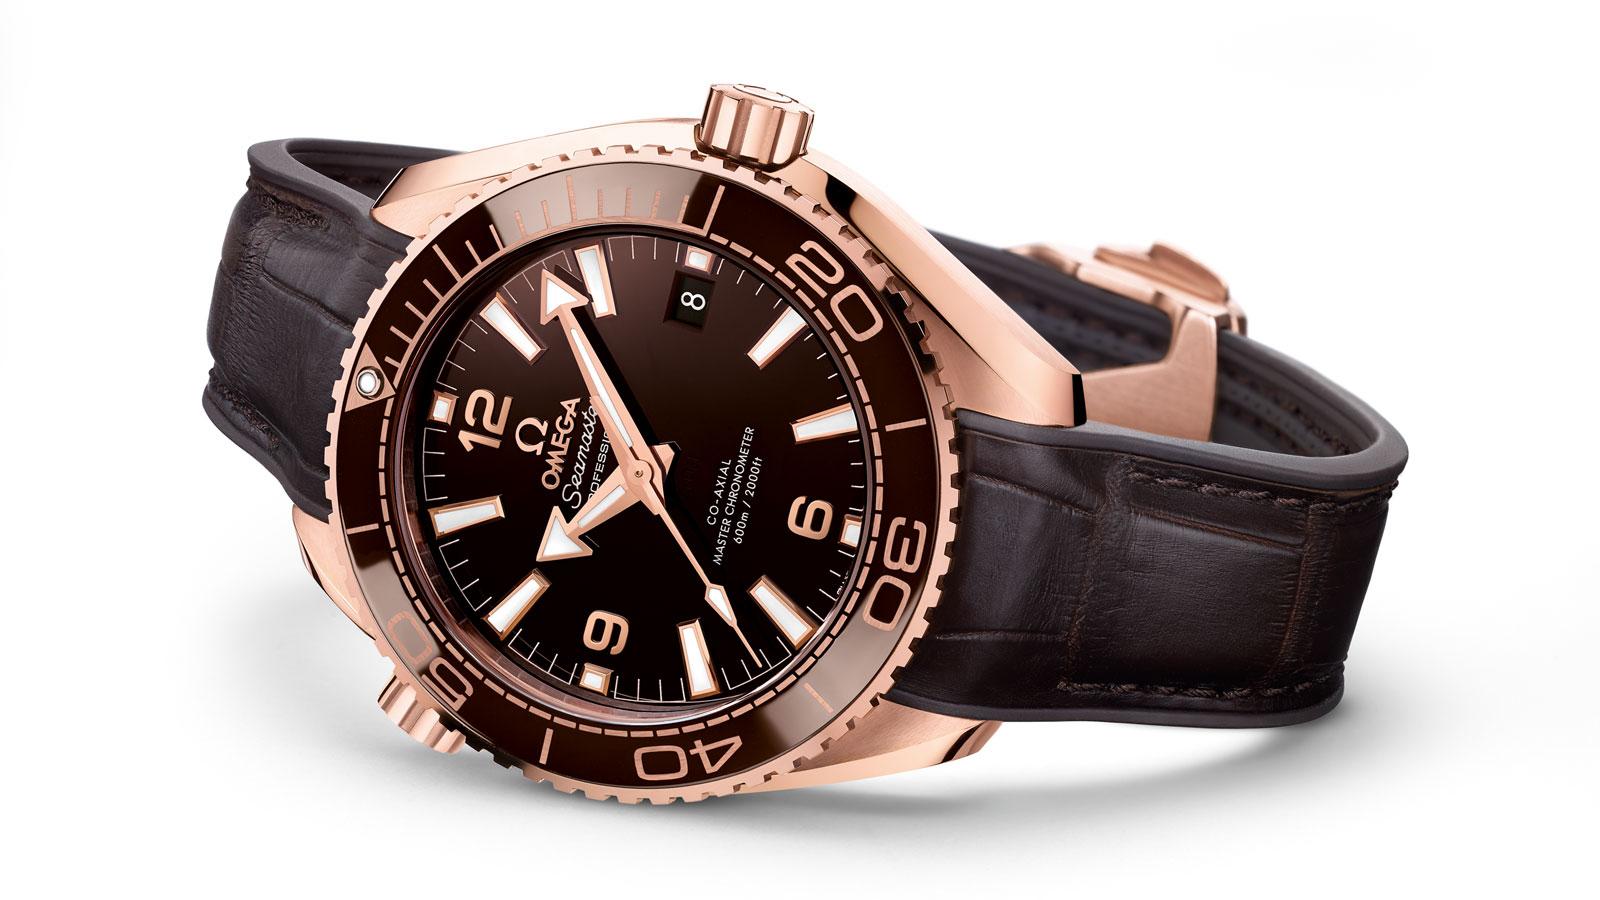 215.63.40.20.13.001_Seamaster-Planet-Ocean-39